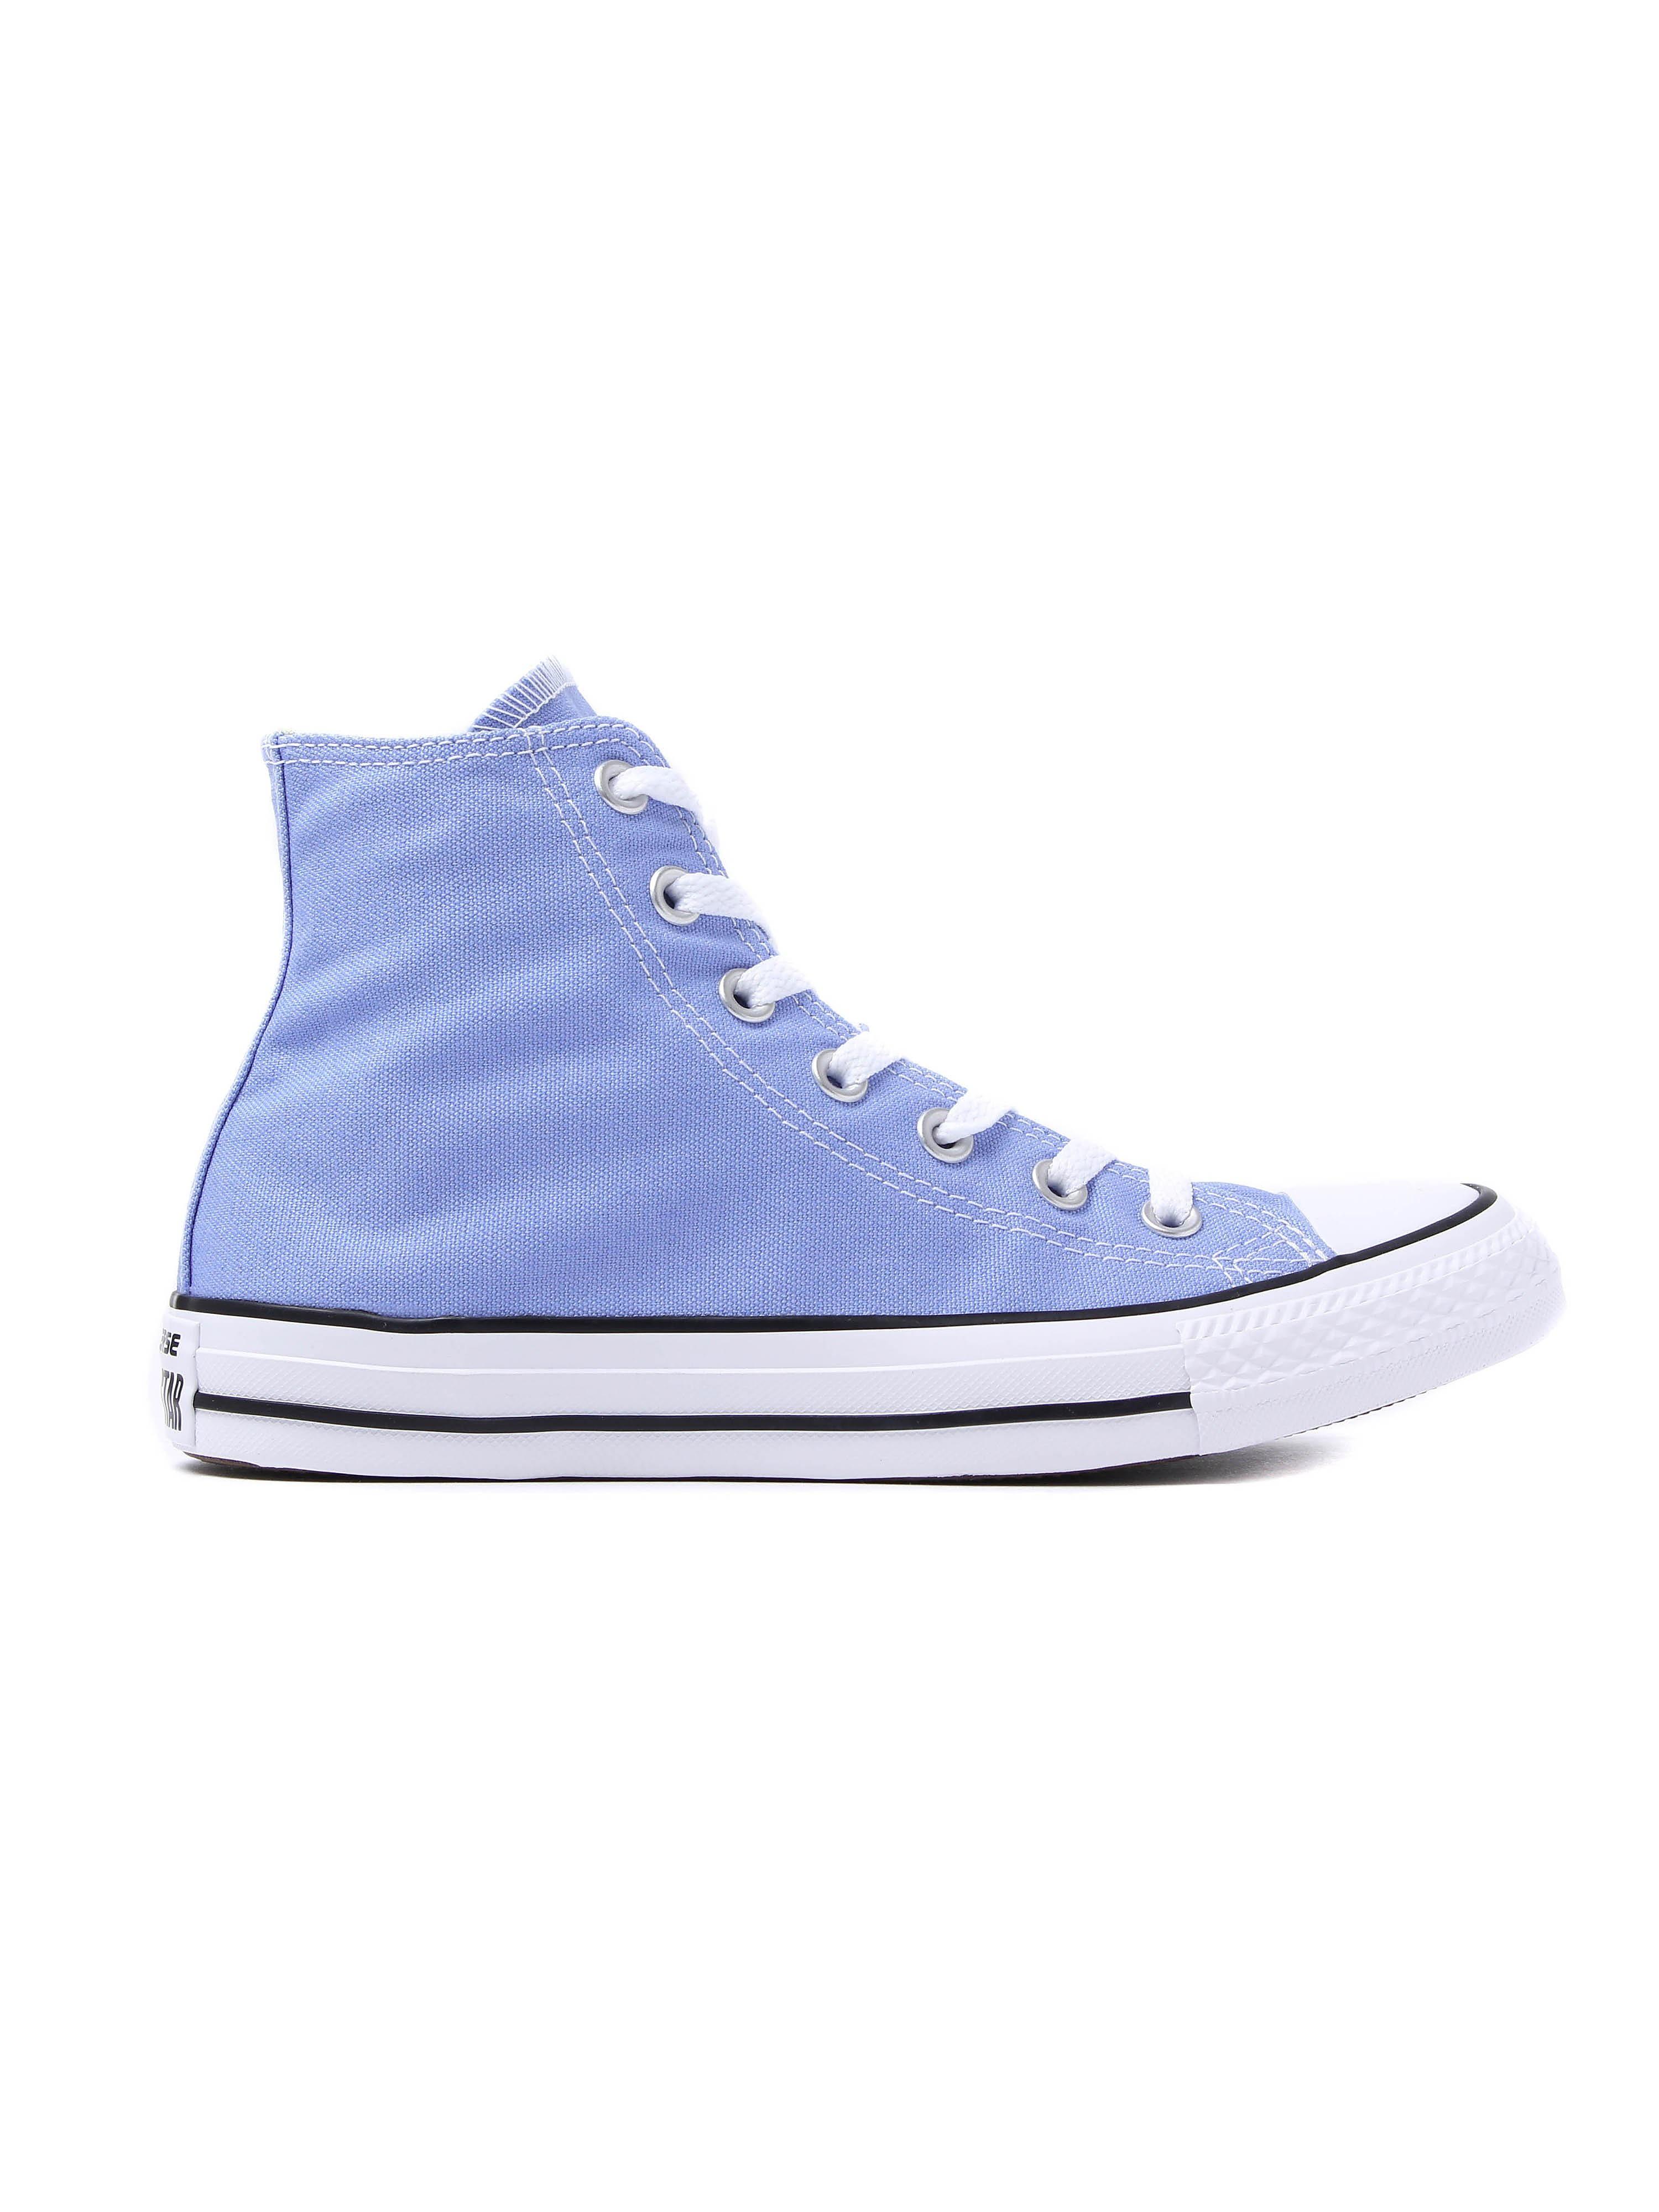 Converse Chuck Taylor All Star Hi Pioneer Blue